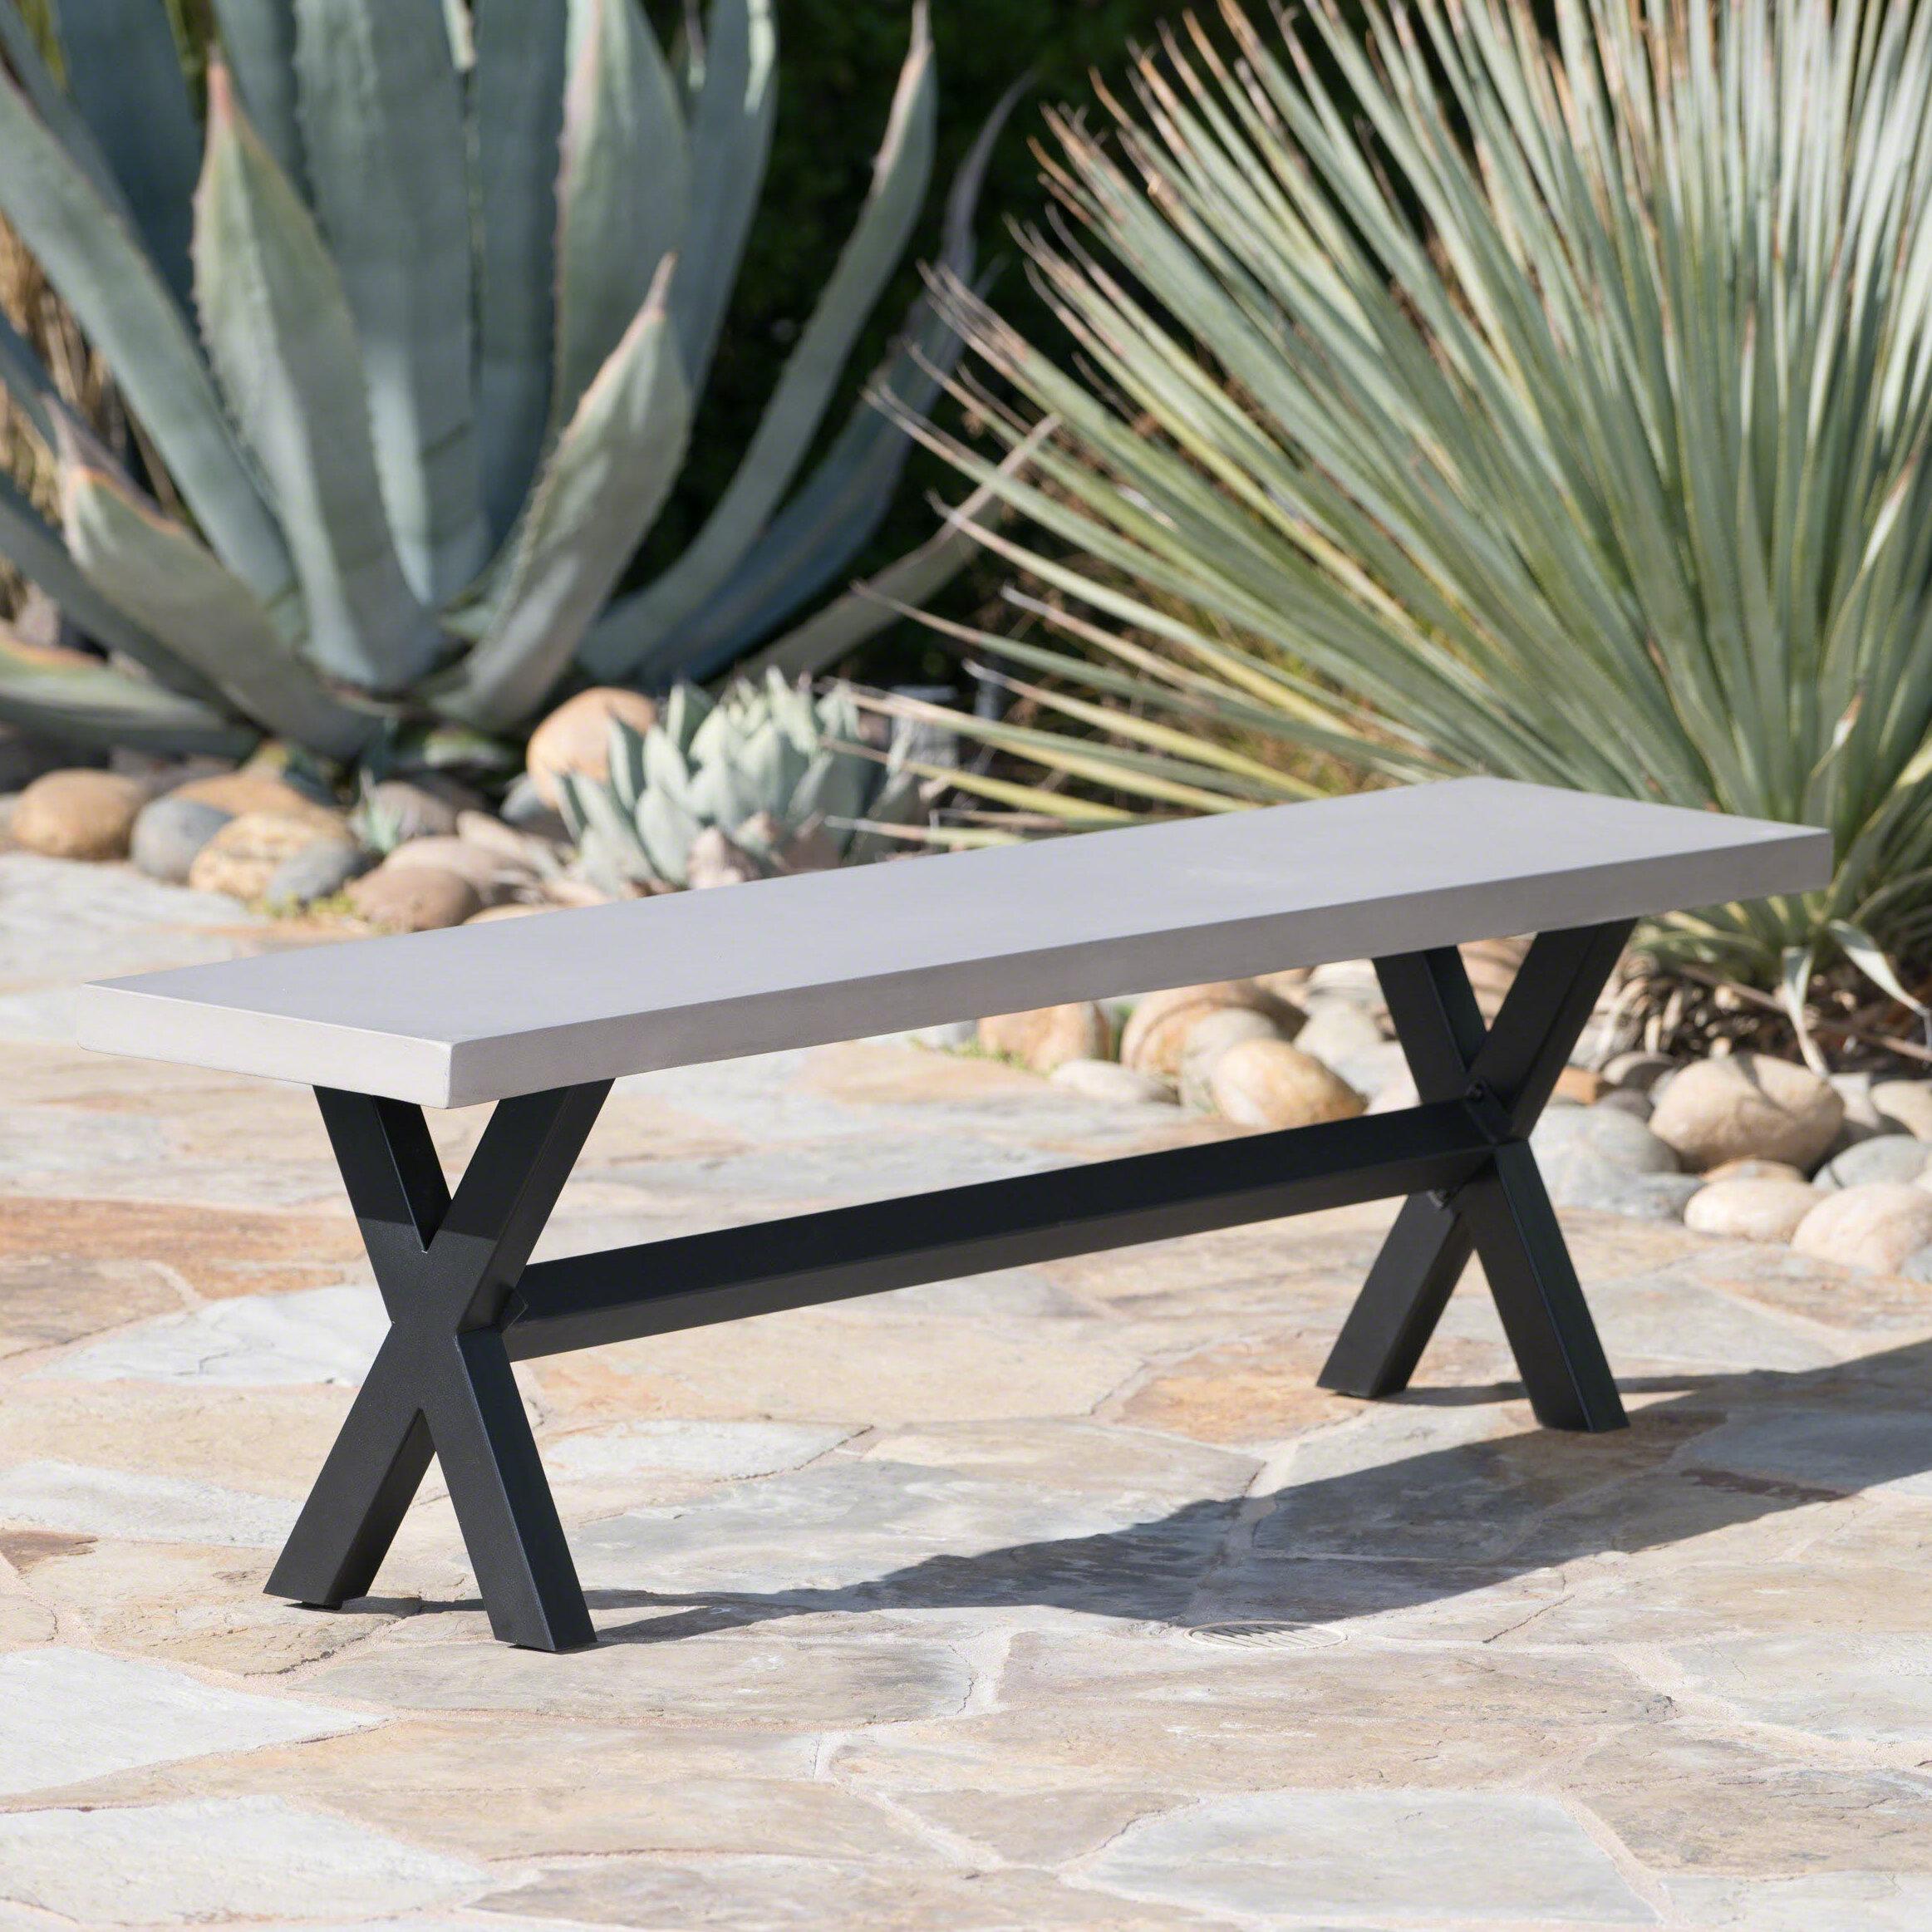 Gracie Oaks Warlick Outdoor Concrete Picnic Bench Reviews Wayfair